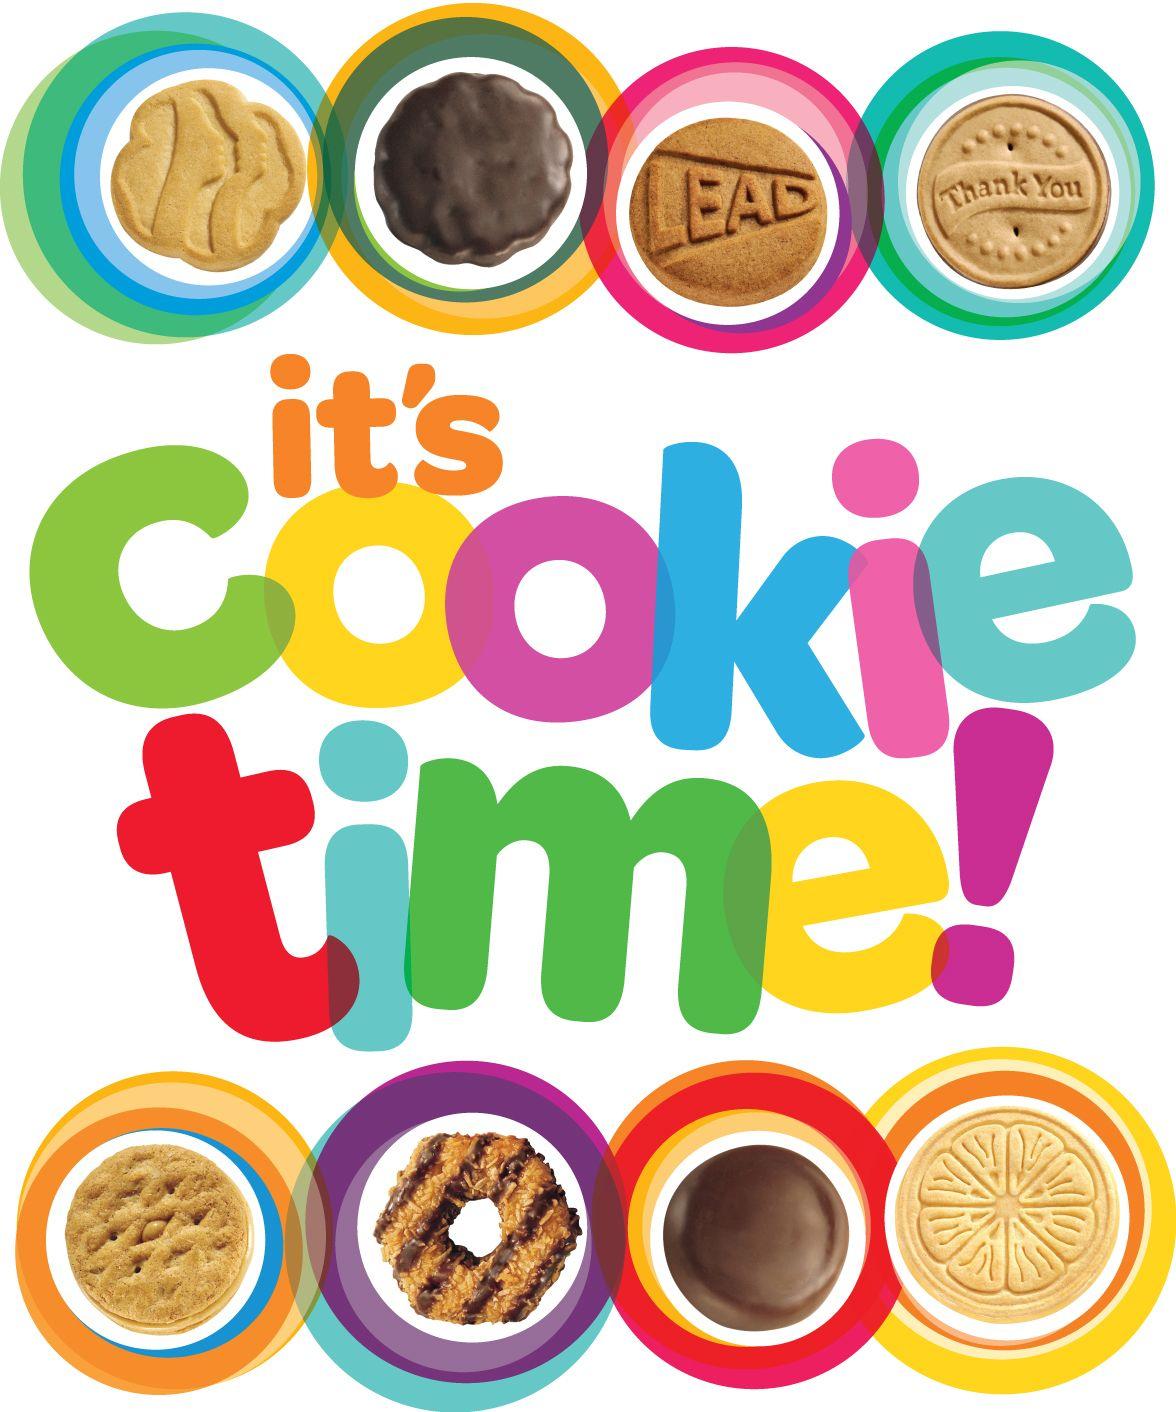 dairy free girl scout cookies ingredients allergen